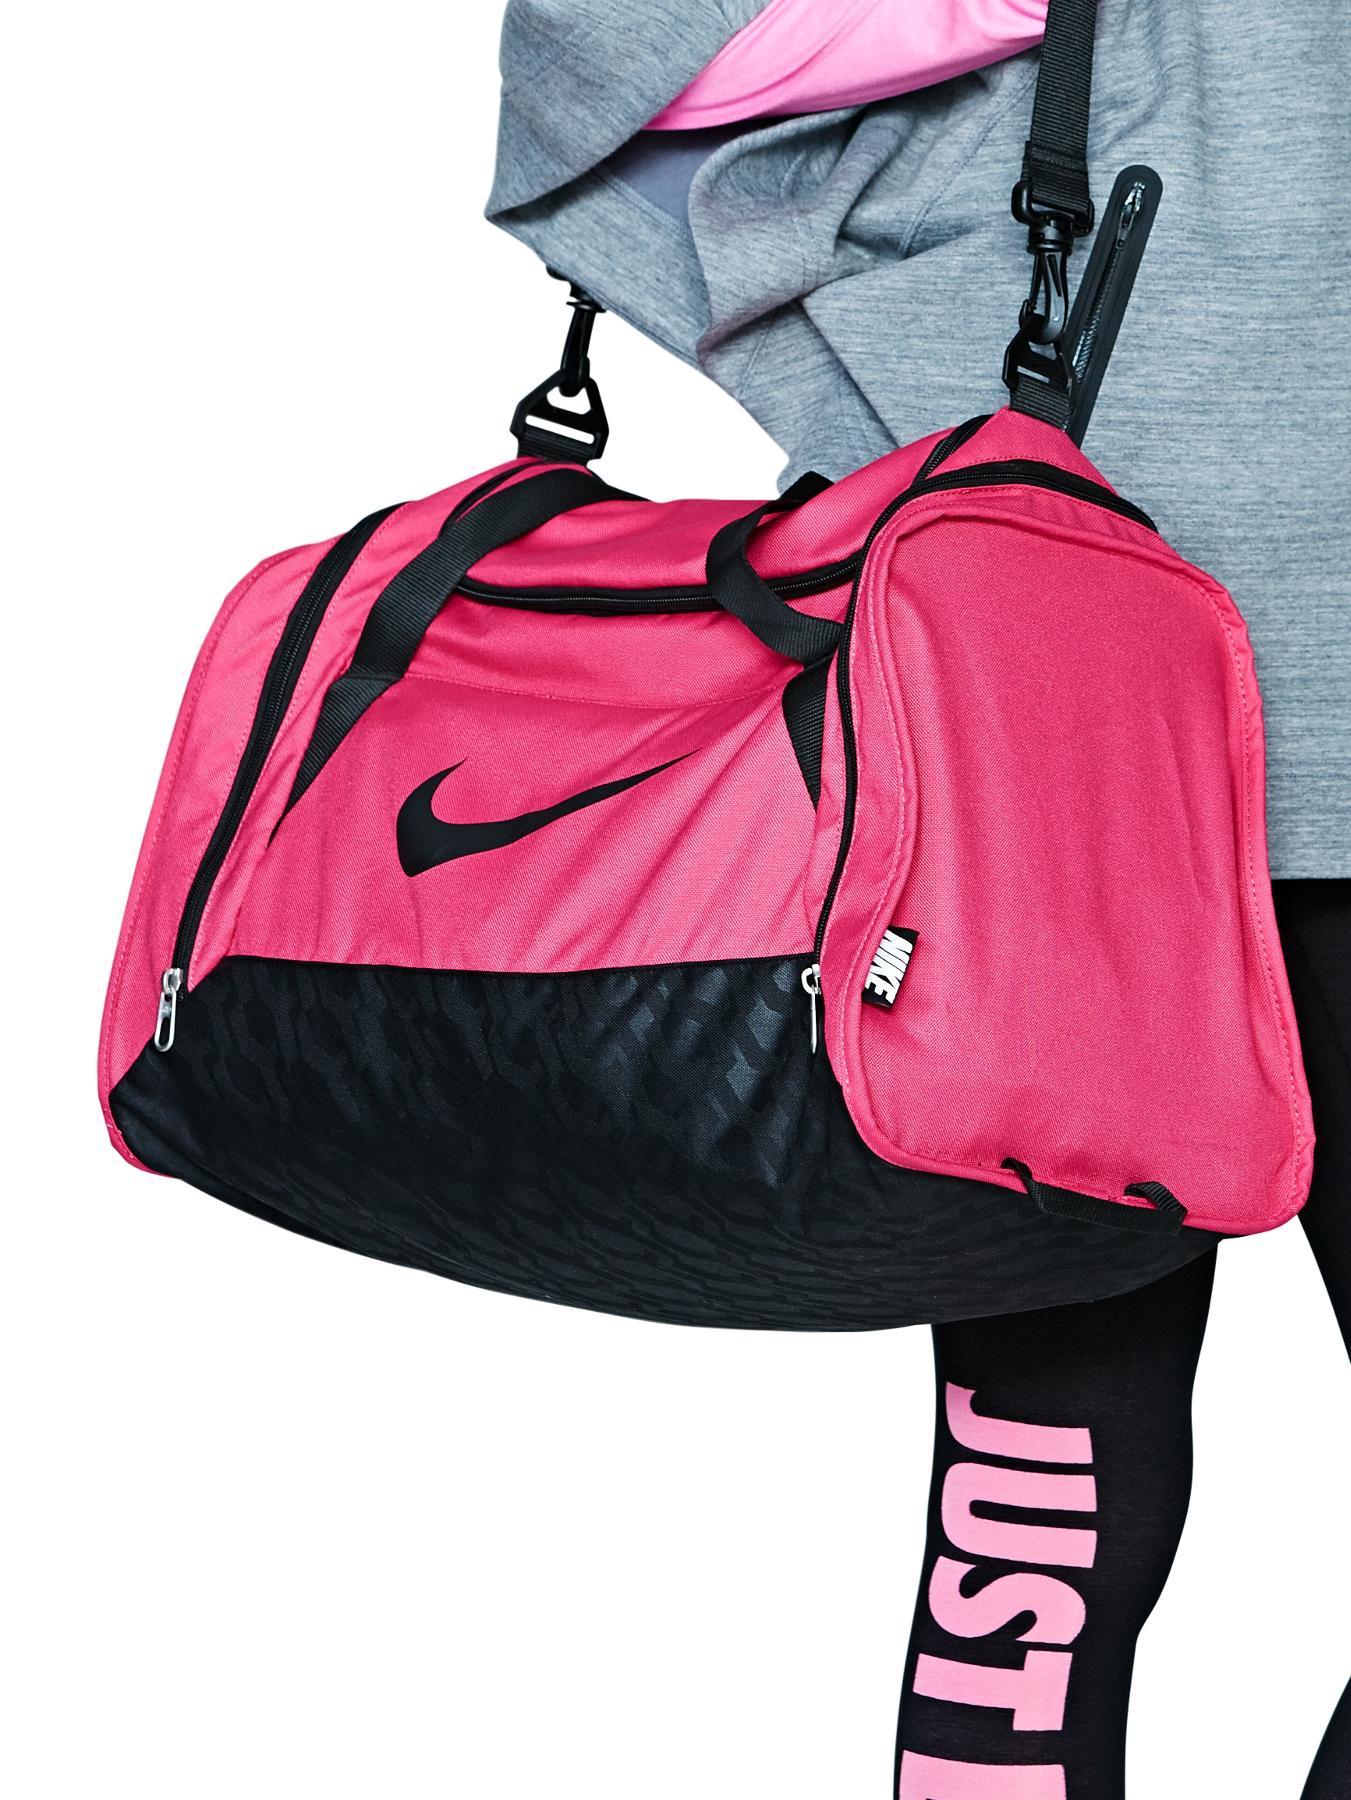 Nike Brasilia Xs Grip Duffle Bag Size  c6c96f397469